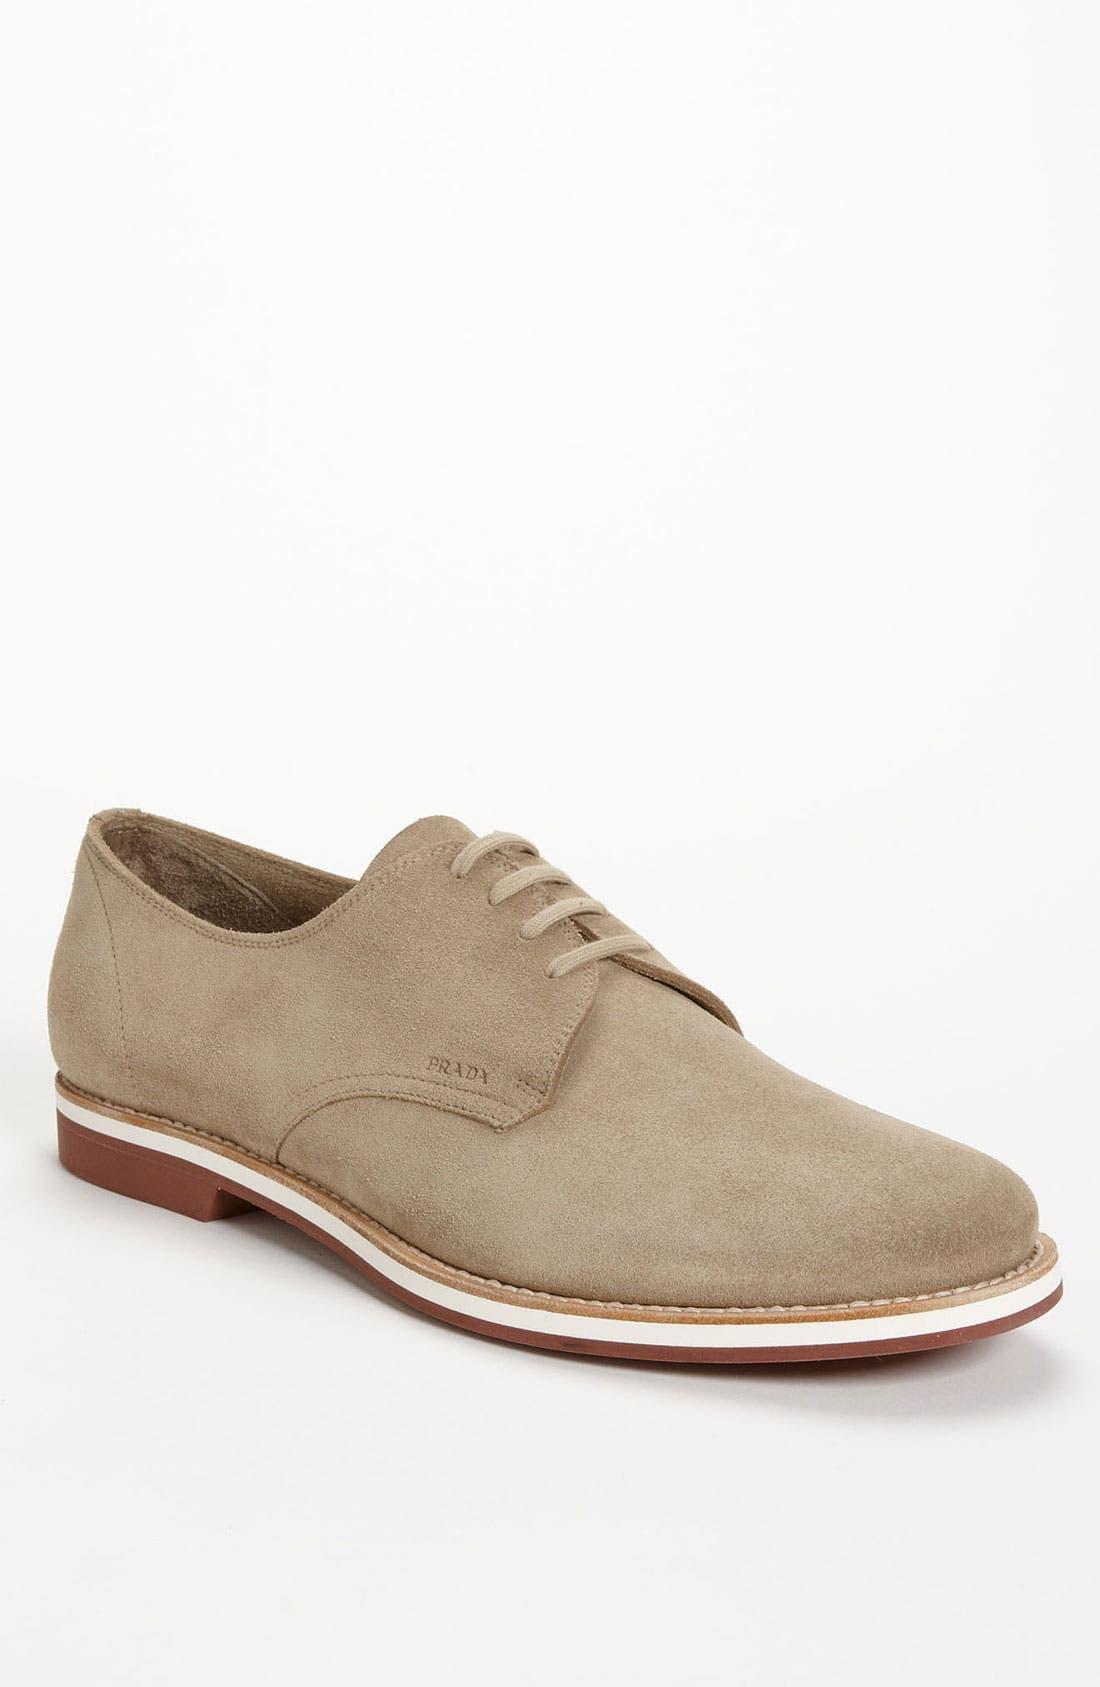 Main Image - Prada Suede Buck Shoe